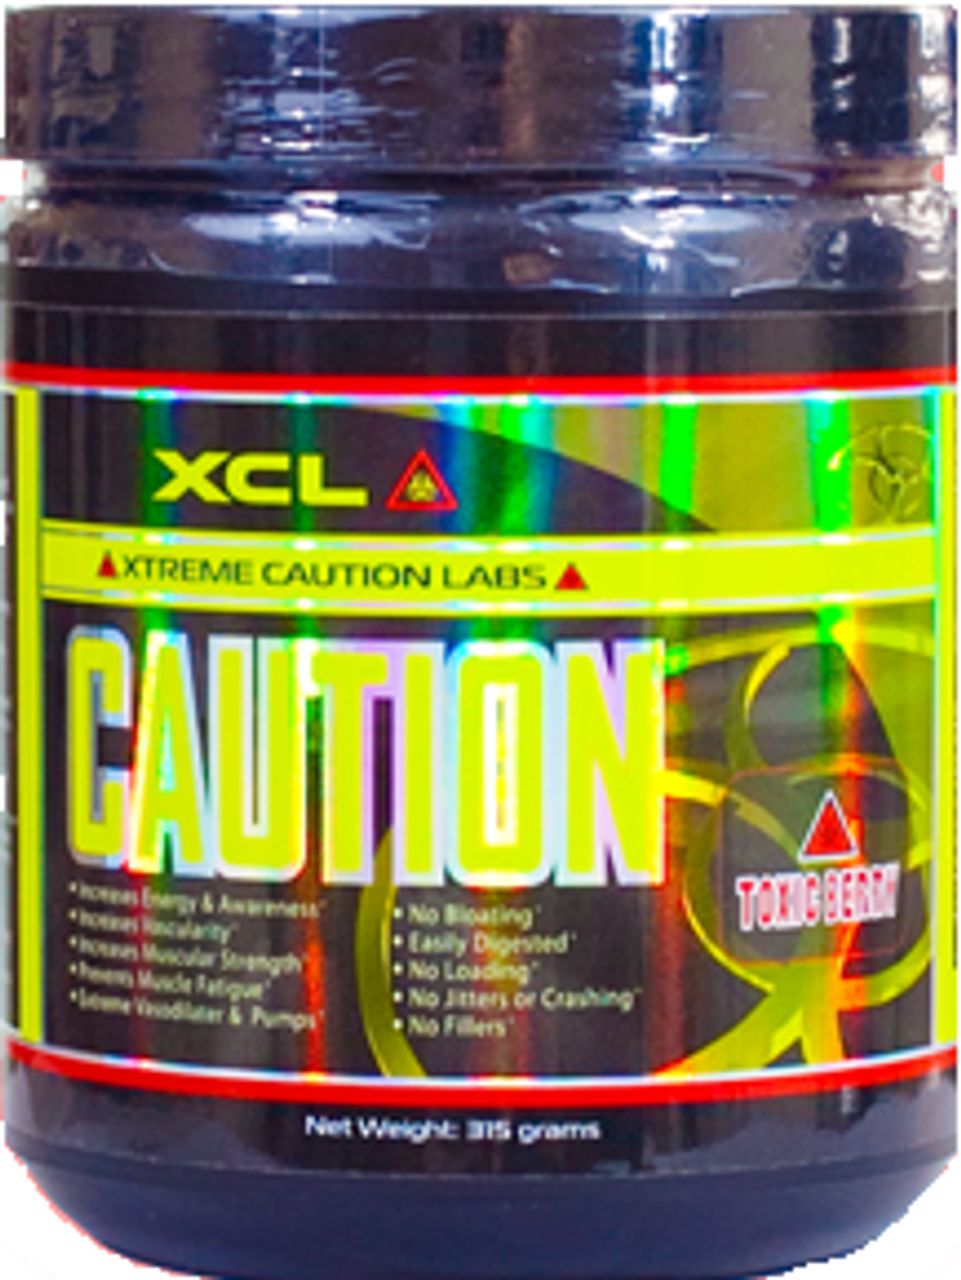 Caution 315g Xtreme Caution Labs